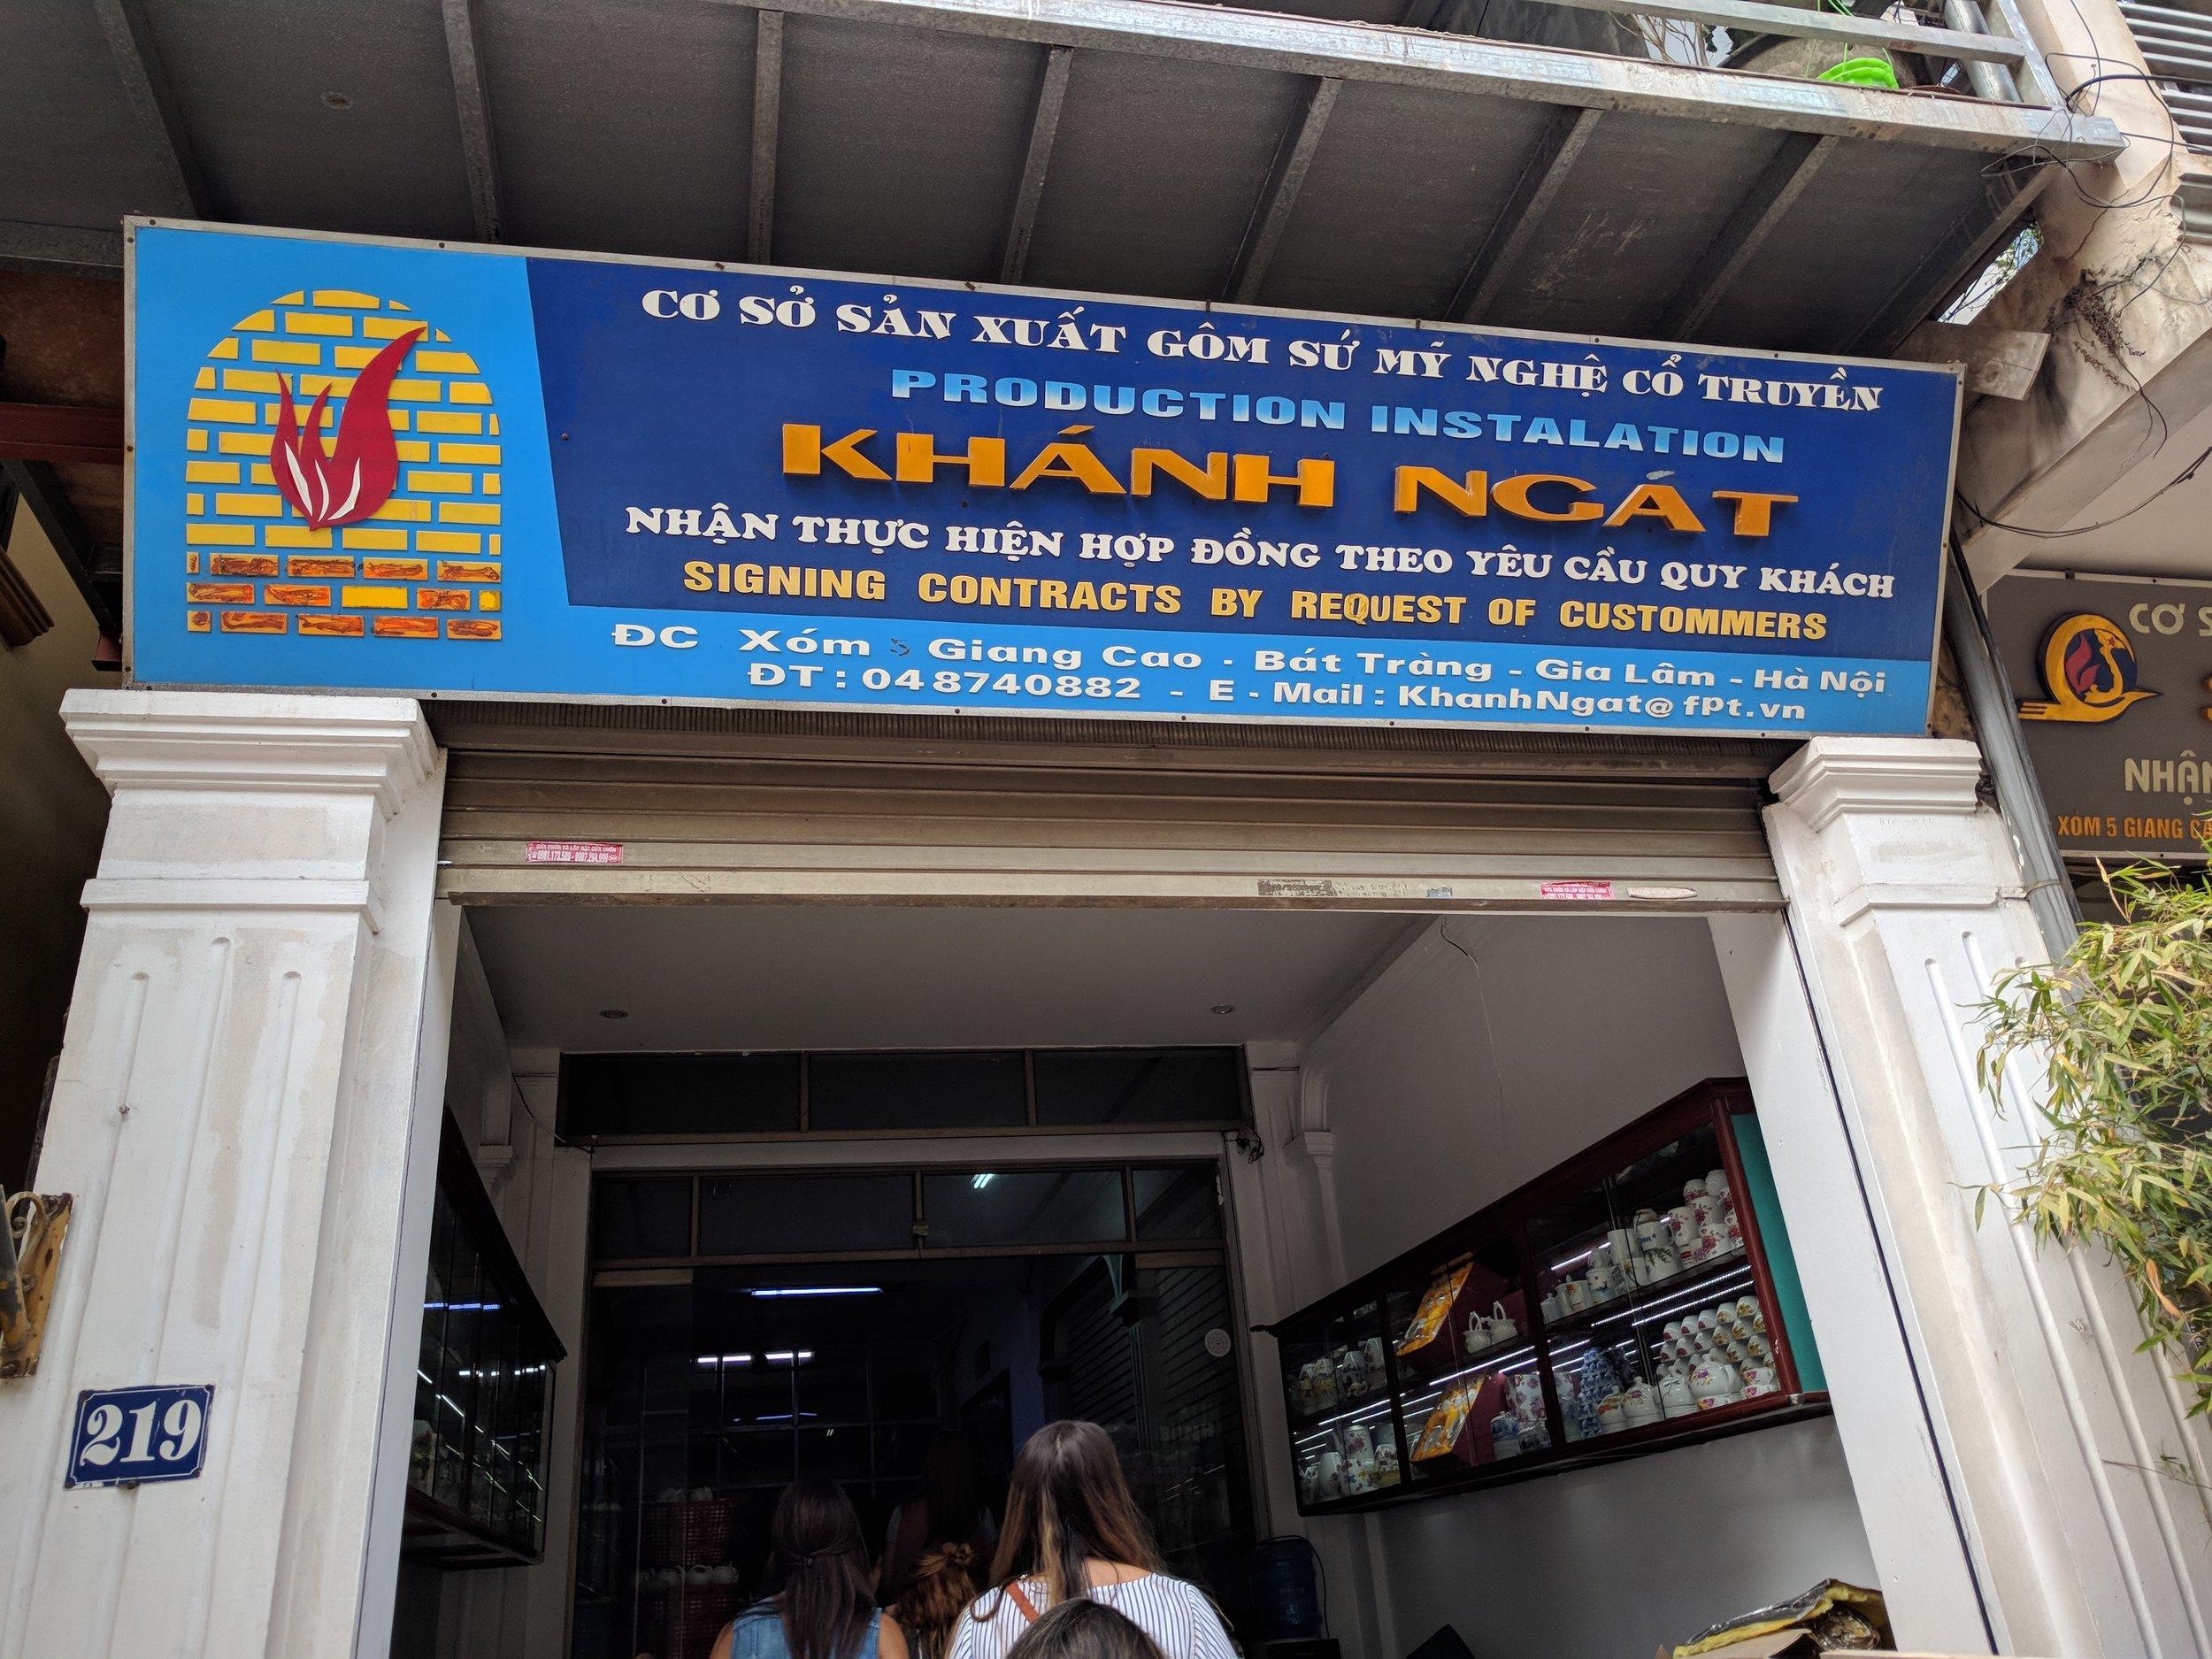 Entering Khanh Ngat, our partner business